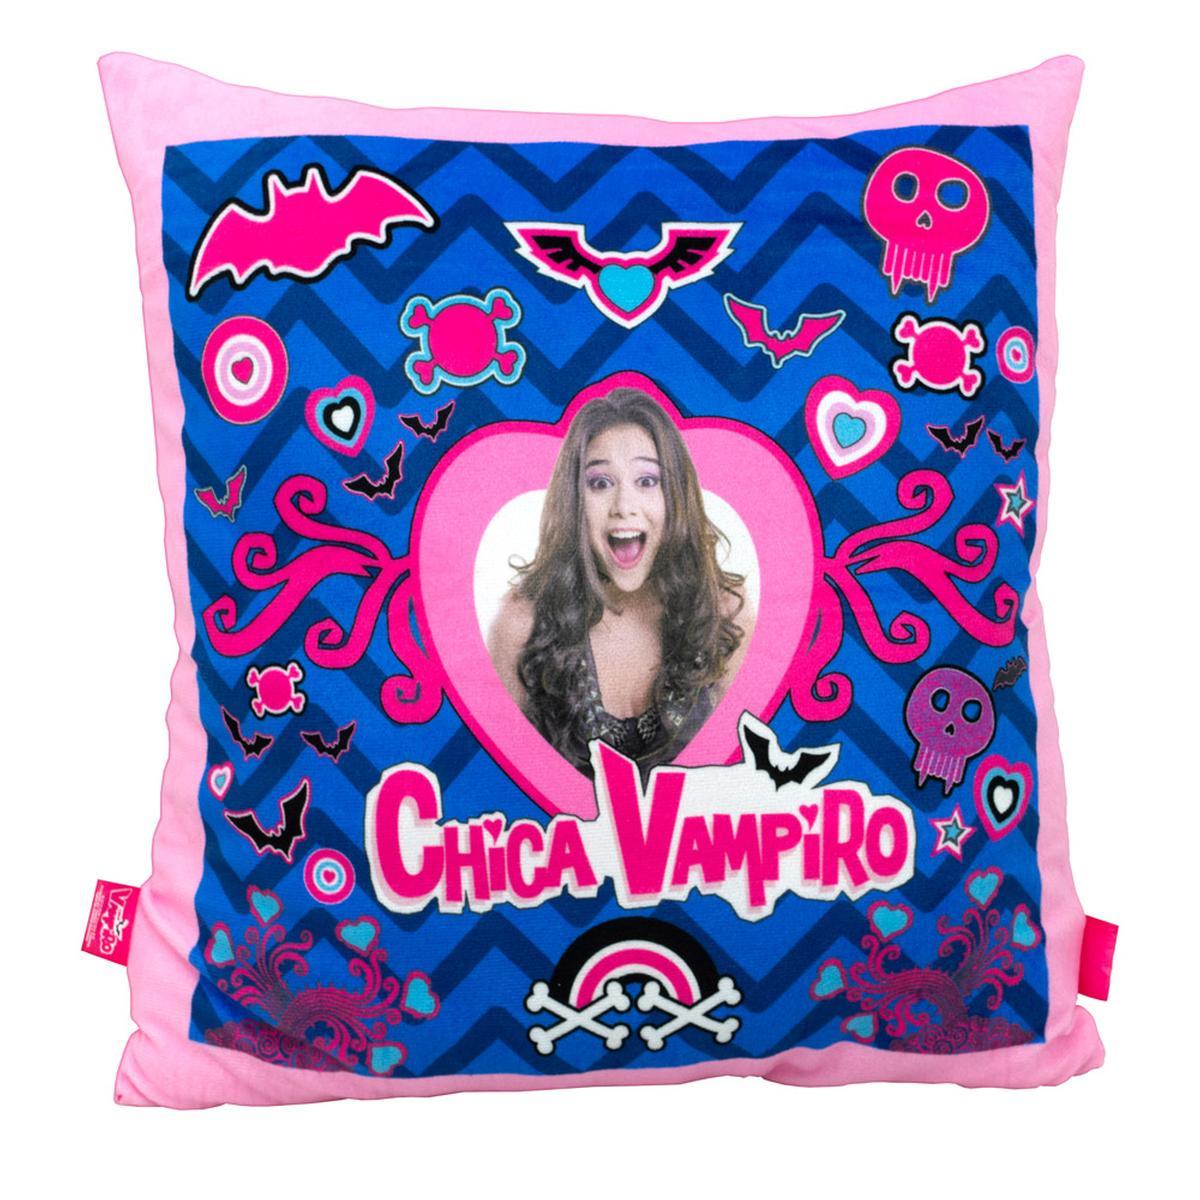 new appearance cute buy Chica Vampiro - Cojín Musical